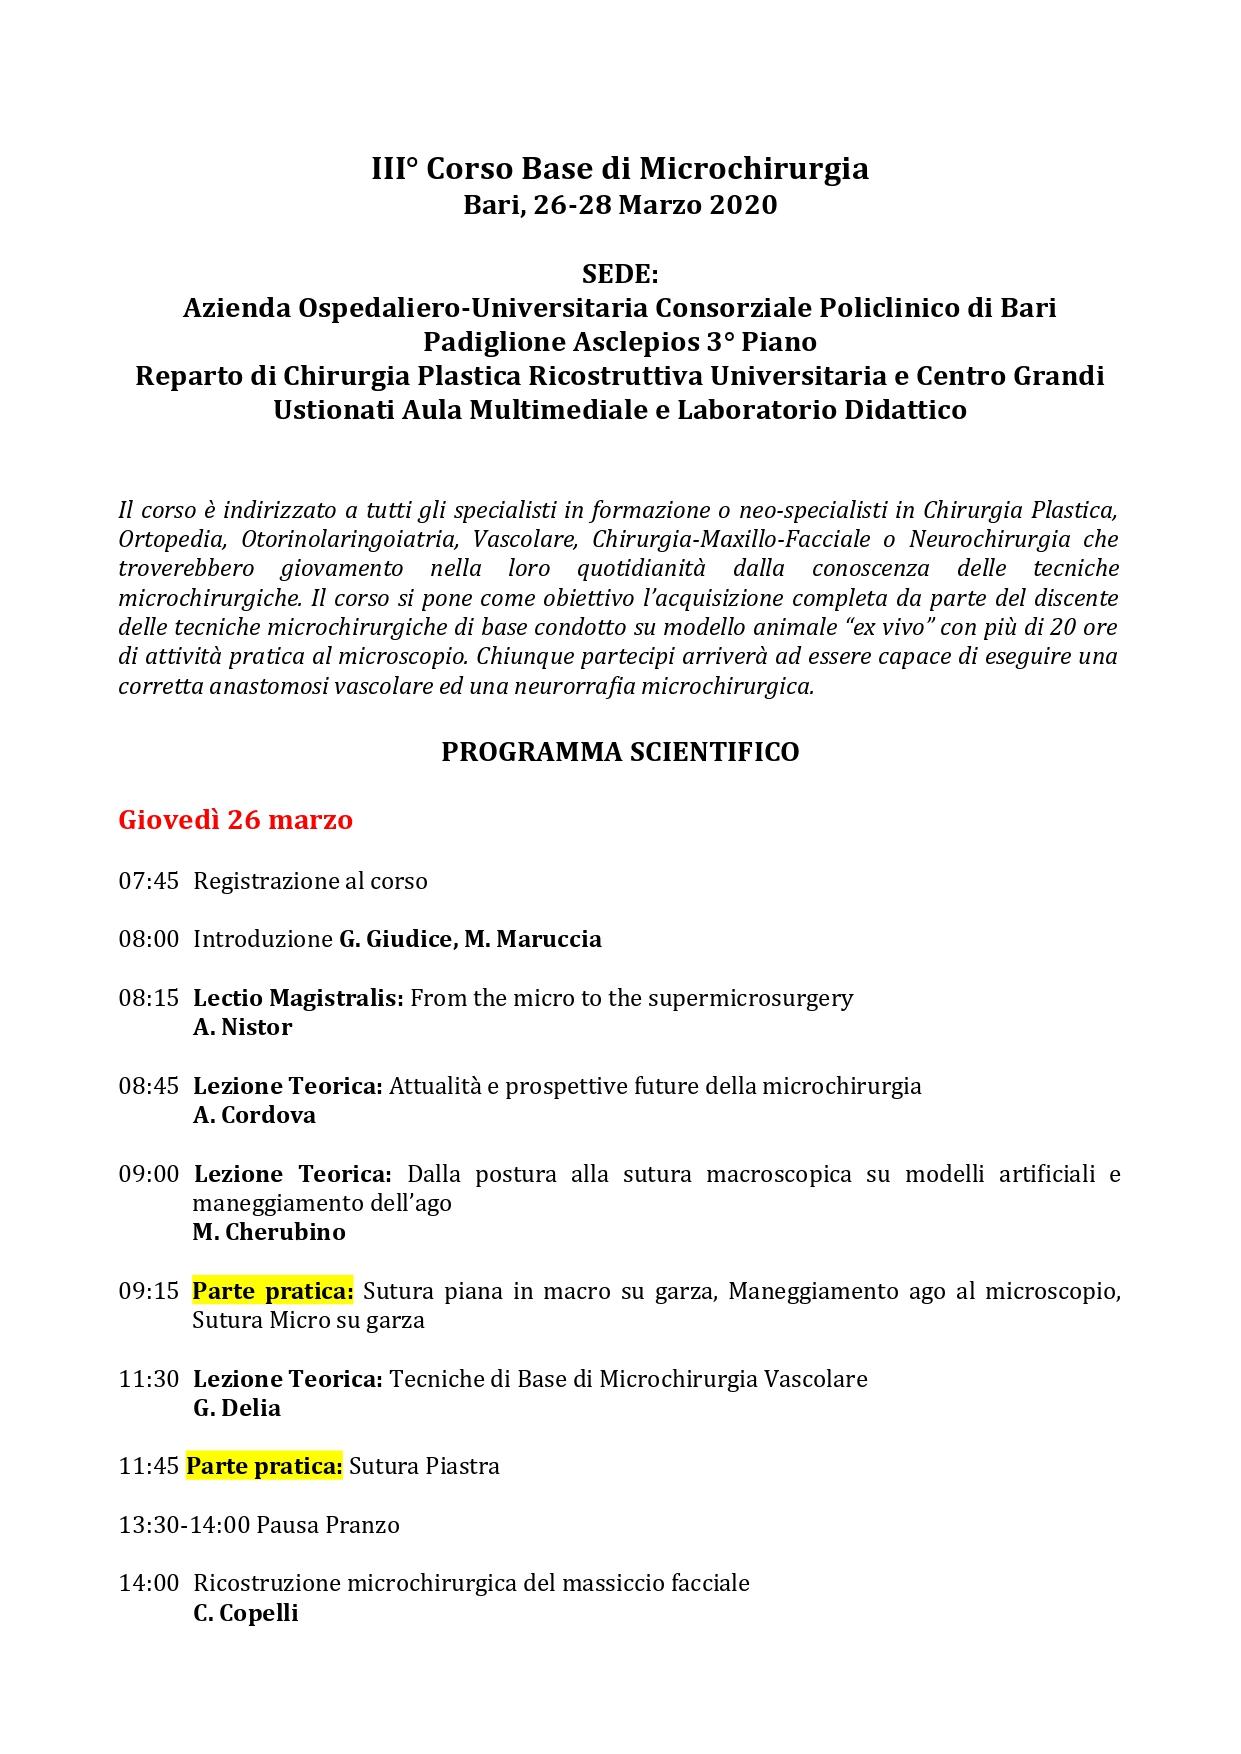 CORSO MICRO III DEFINITIVO_page-0001